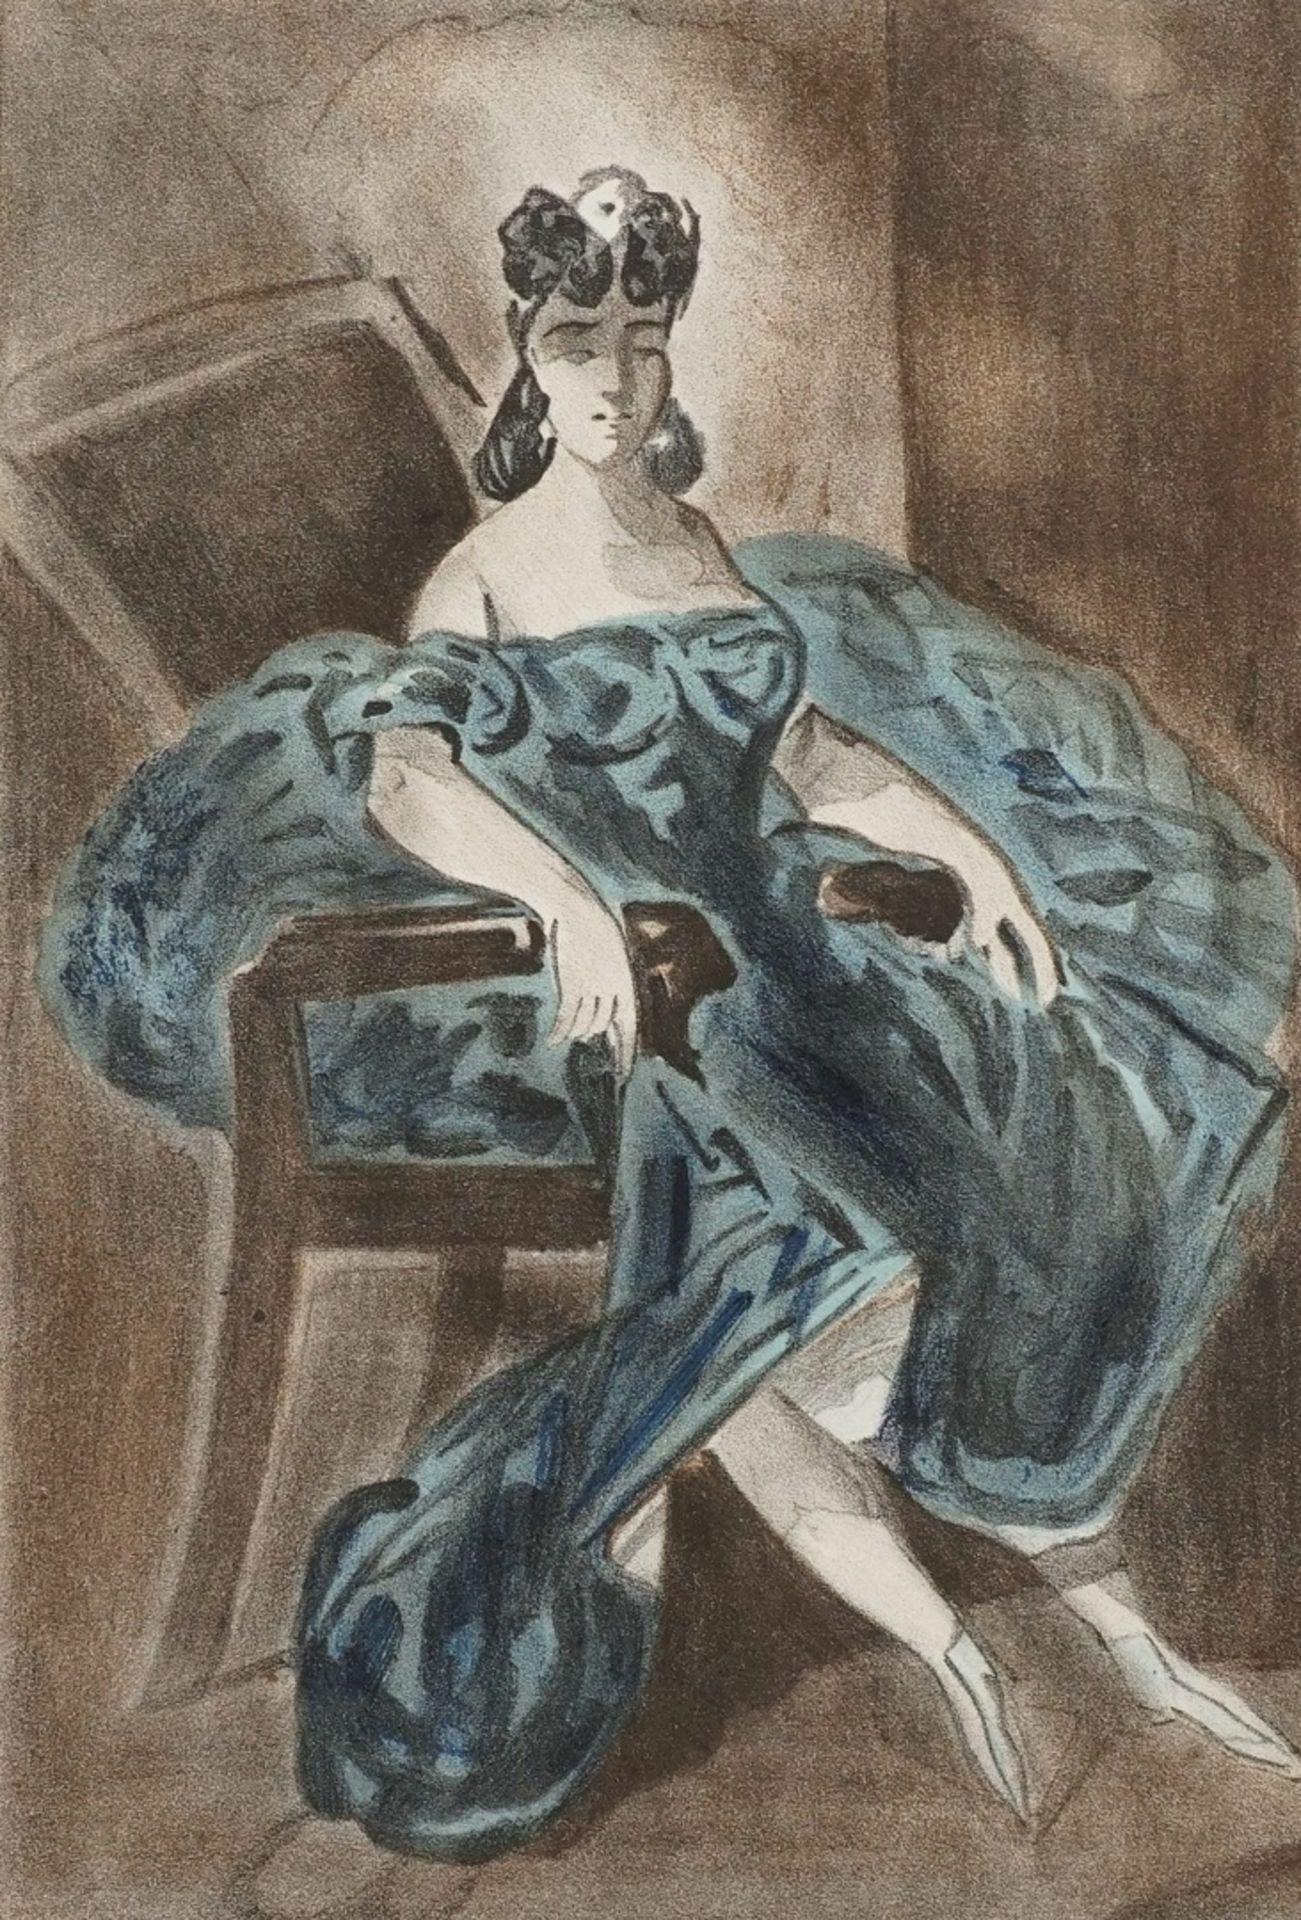 Constantin Guys, Sitzende Dame in türkisblauem Kleid